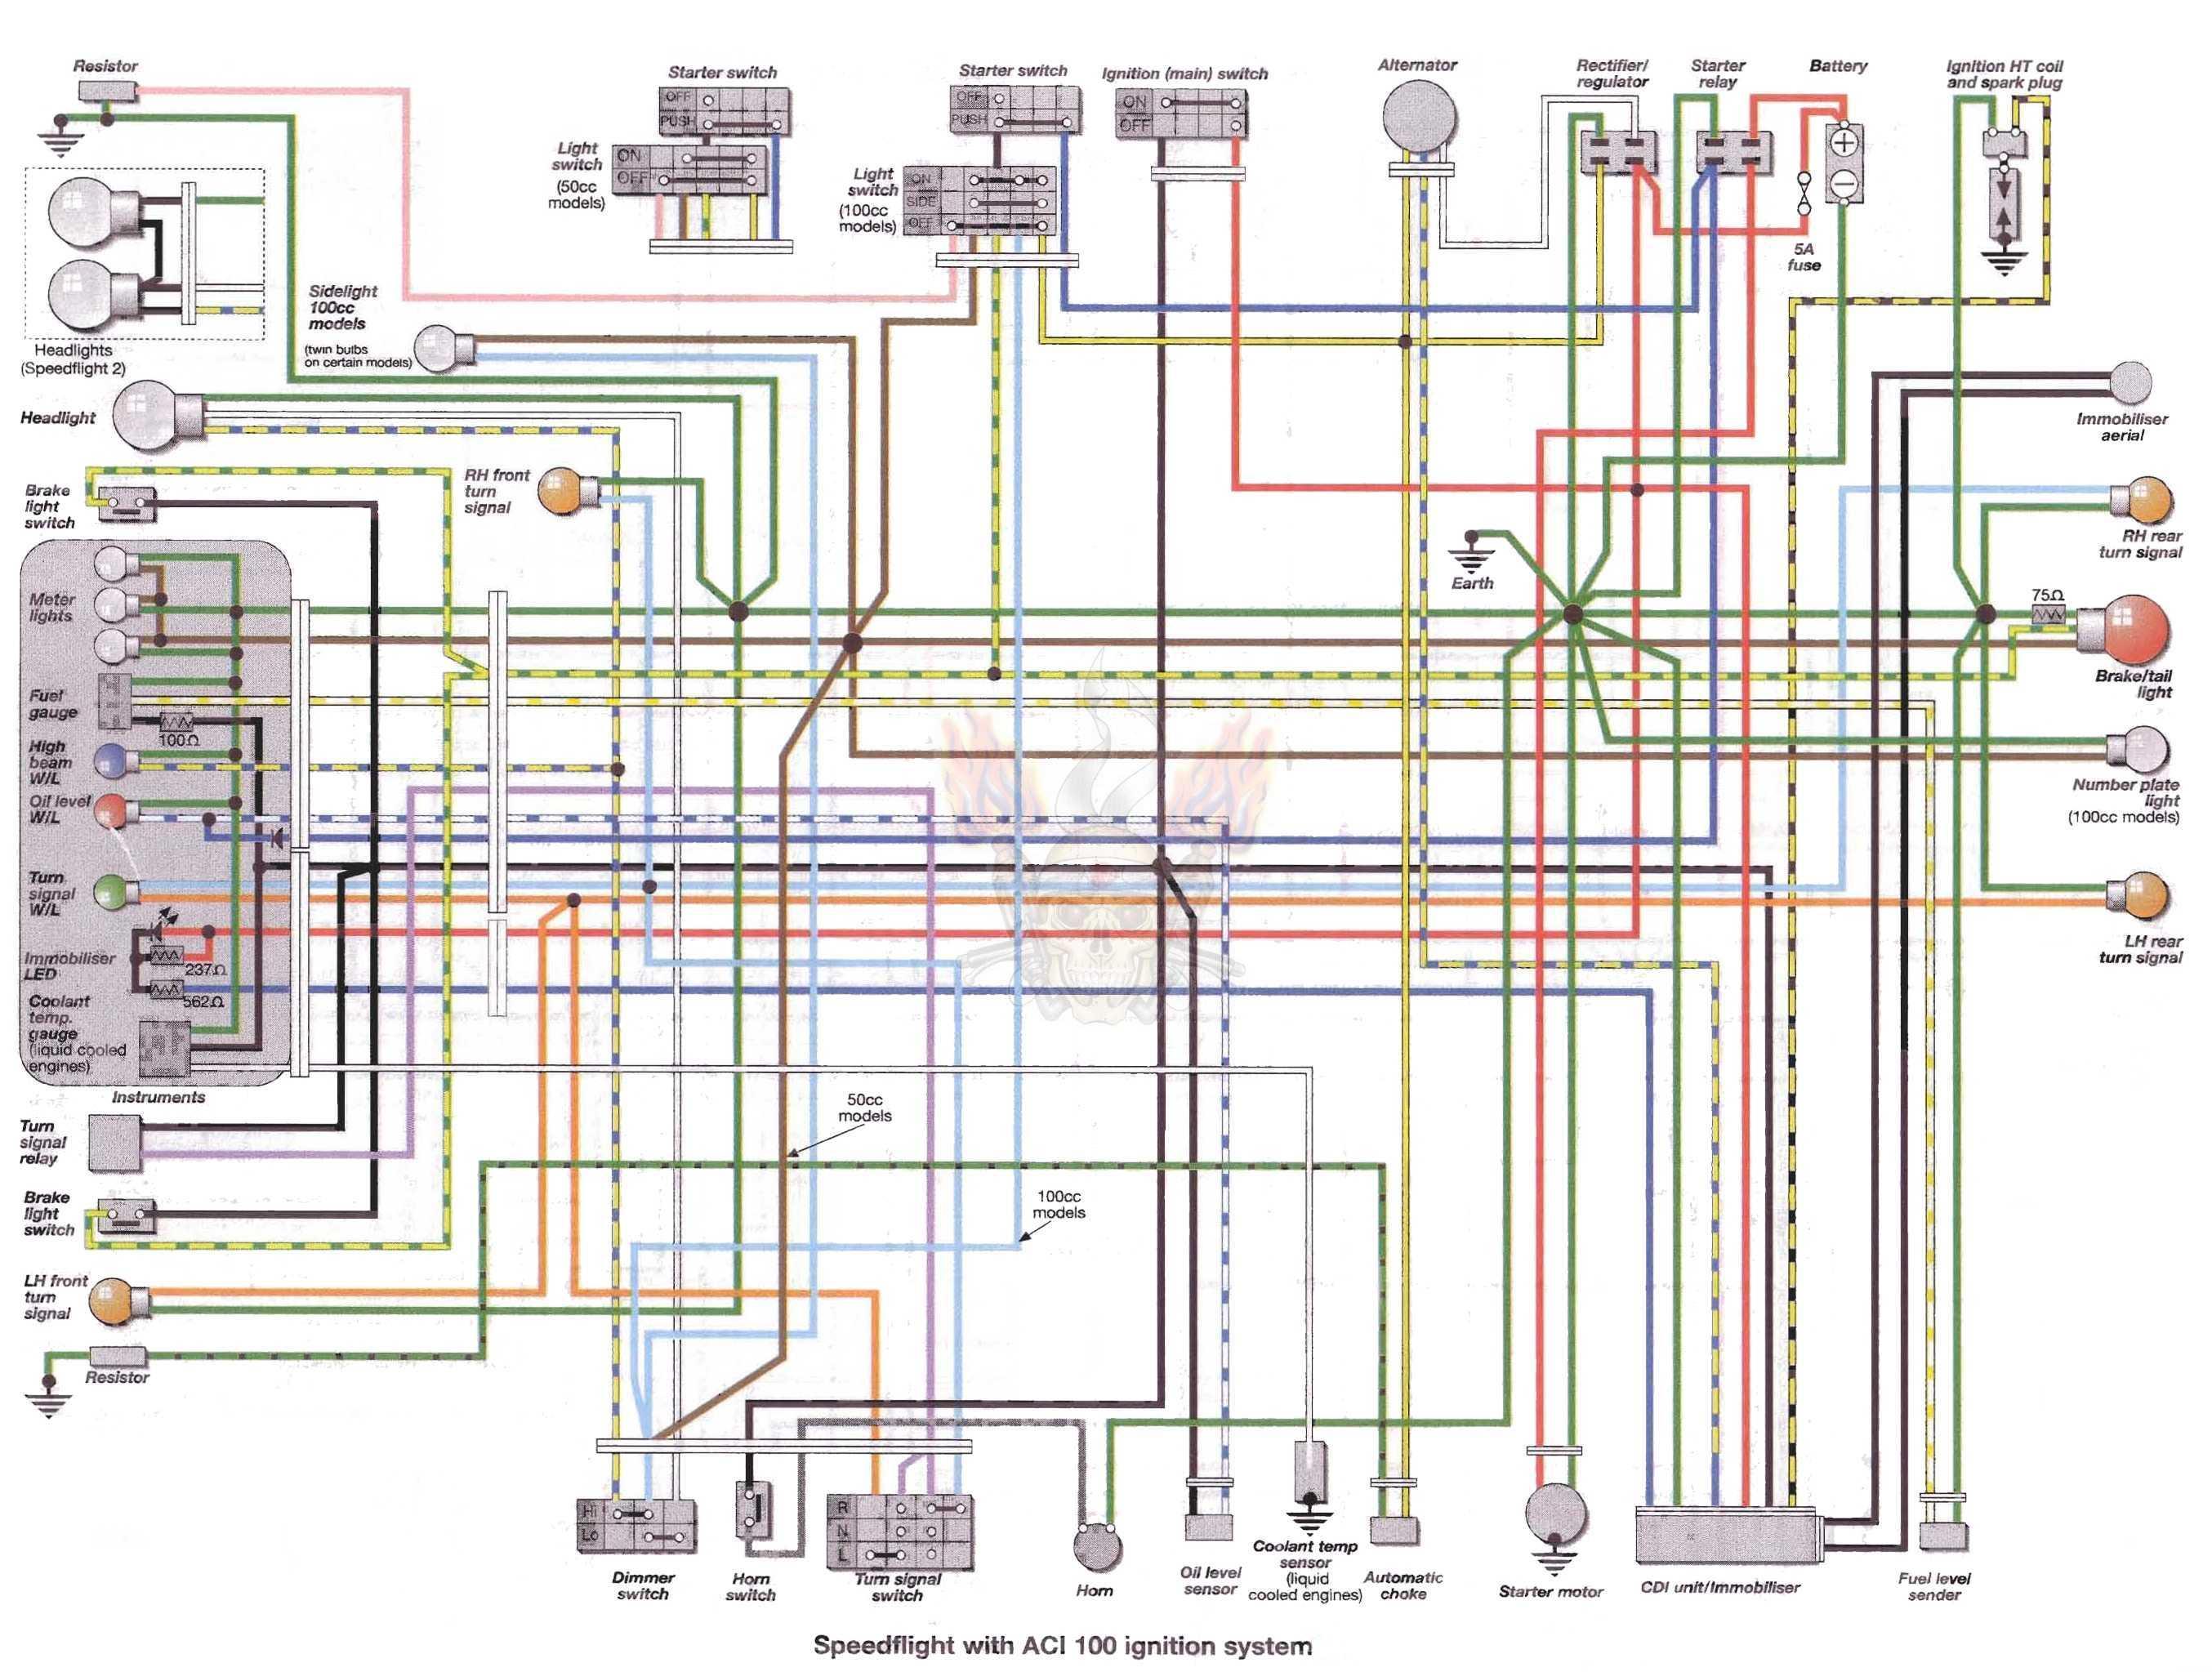 peugeot v clic wiring diagram schematic diagram peugeot v clic wiring diagram download [ 2708 x 2047 Pixel ]